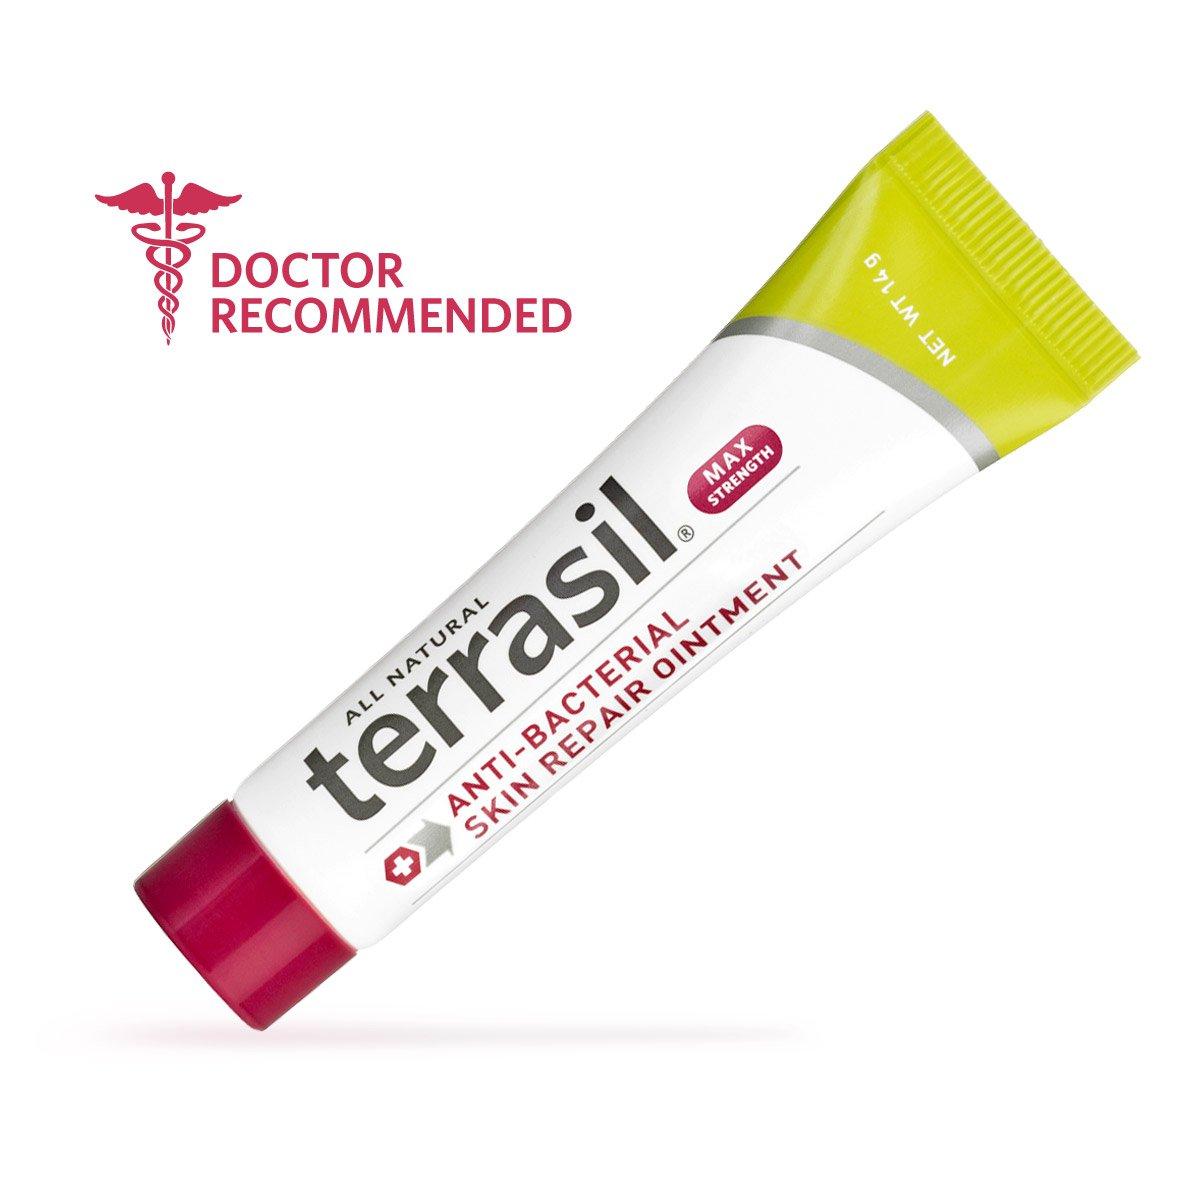 Antibacterial Skin Repair MAX 3X Faster Dr. Recommended 100% Guaranteed All Natural Fissures Folliculitis Angular Cheilitis Impetigo Chilblains Lichen Sclerosus Boils Cellulitis by Terrasil®